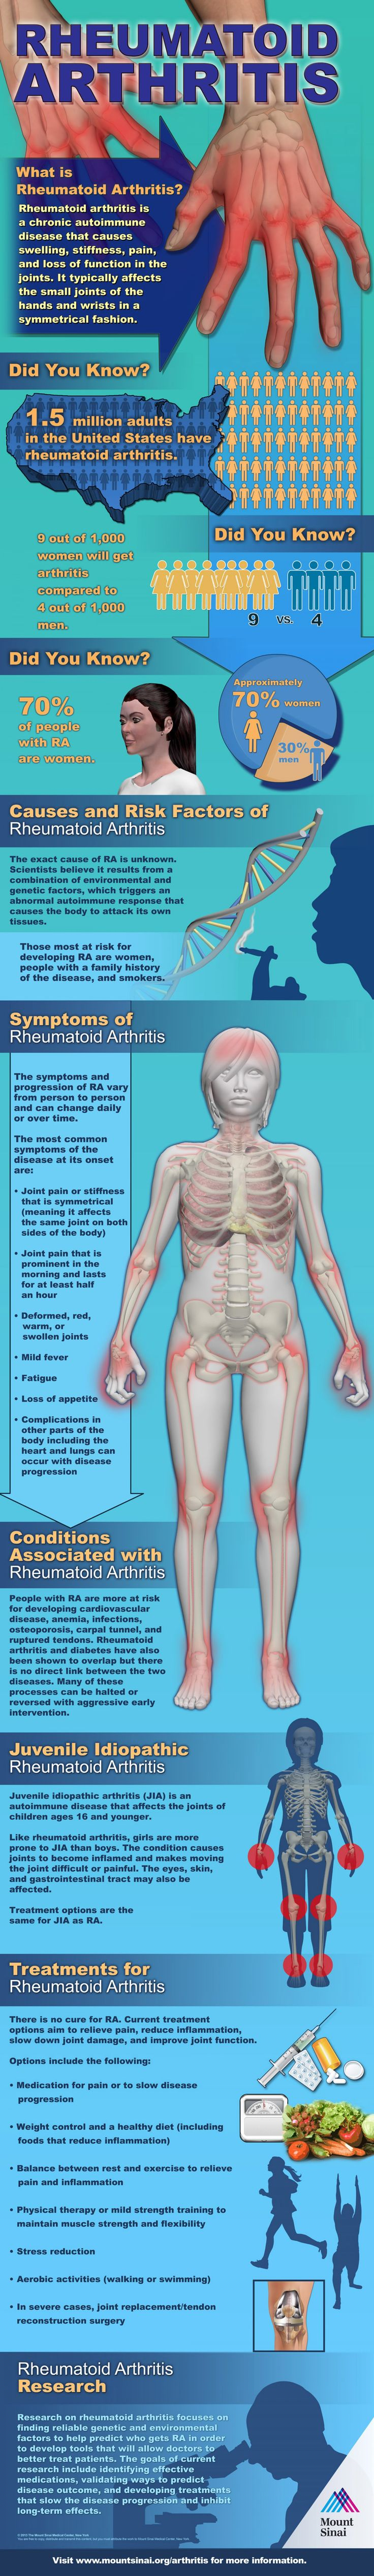 Rheumatoid Arthritis  #infographic